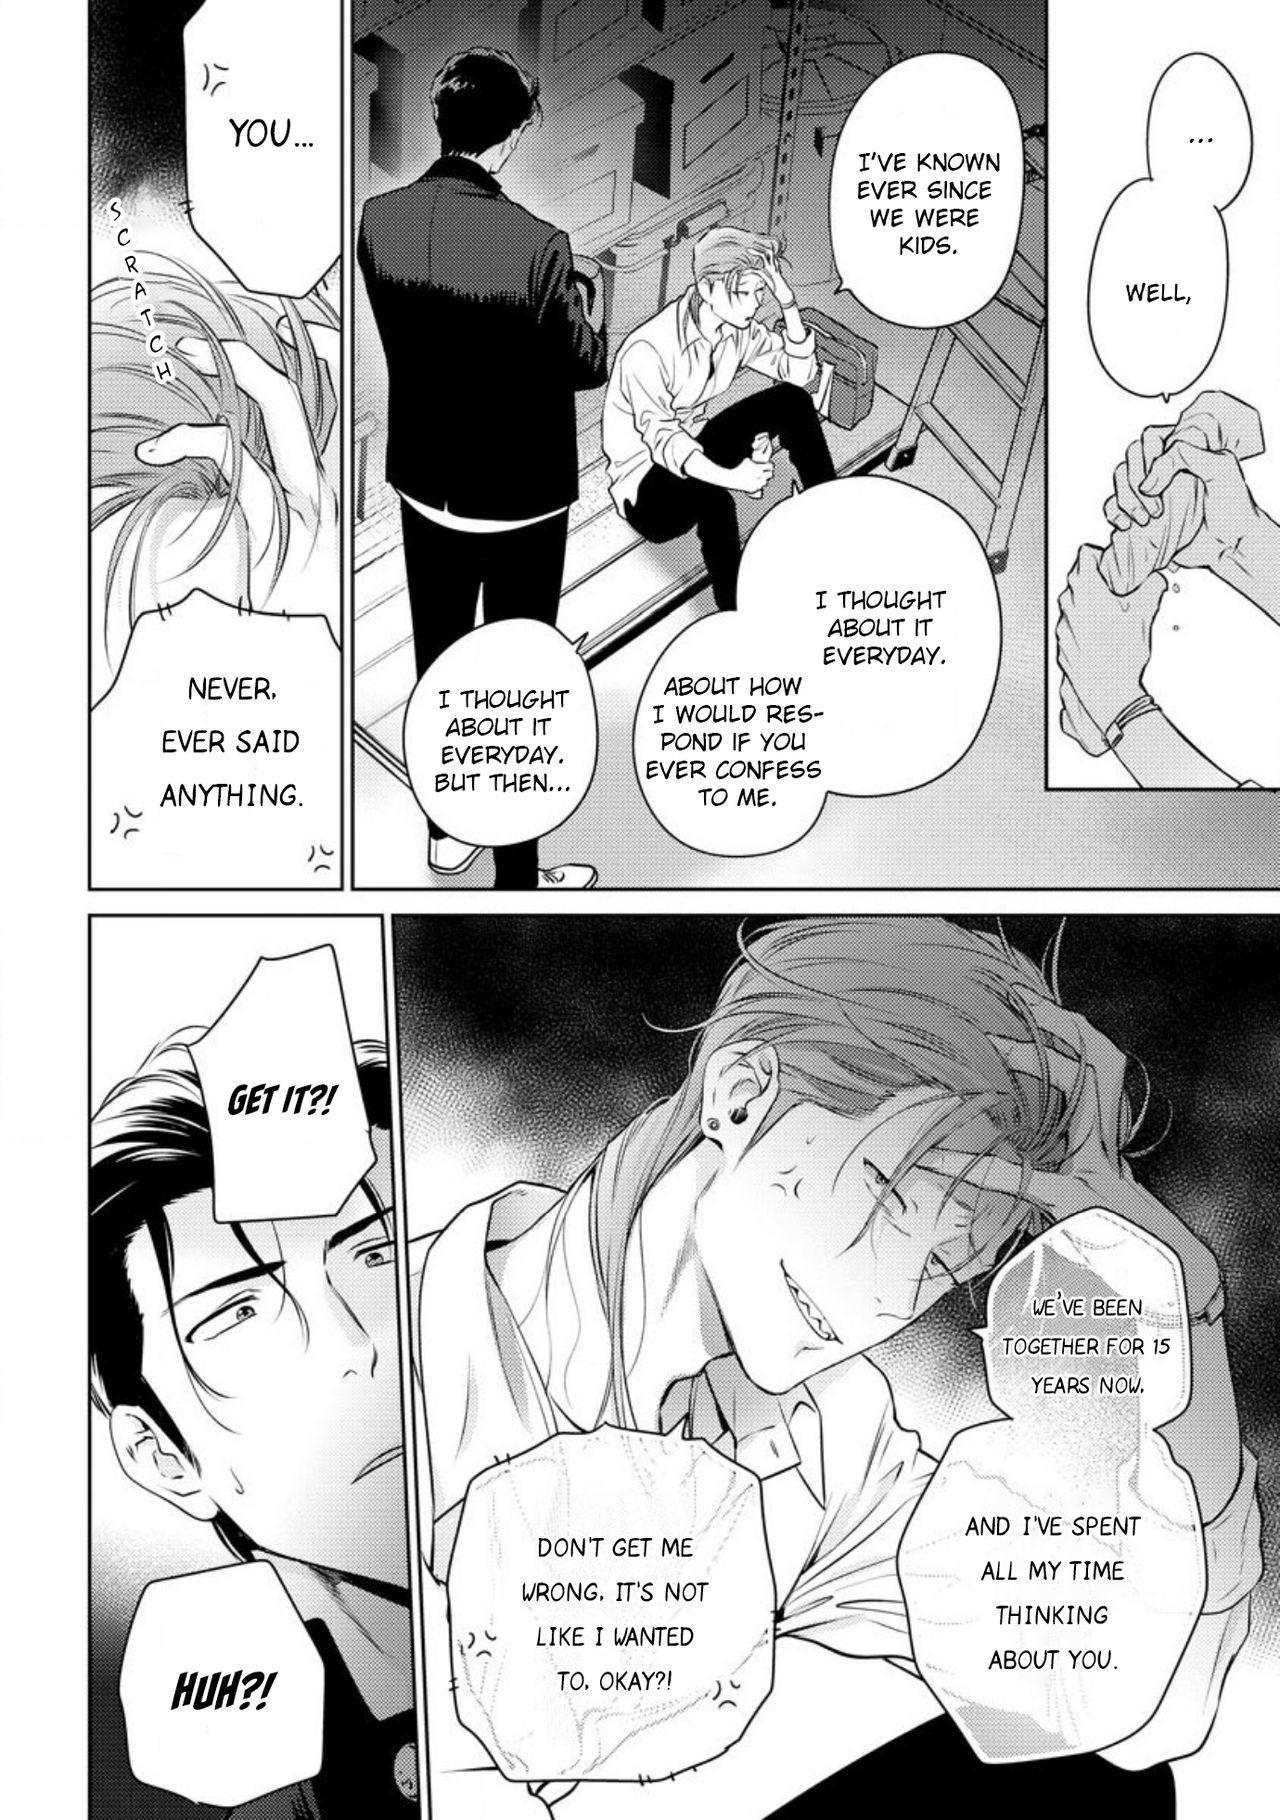 [Hiiragi Nozomu] Nakasete Yaru yo Yankee-kun   I'll Make You Cry Ch. 1-5 + Extras [English] [Digital] 36